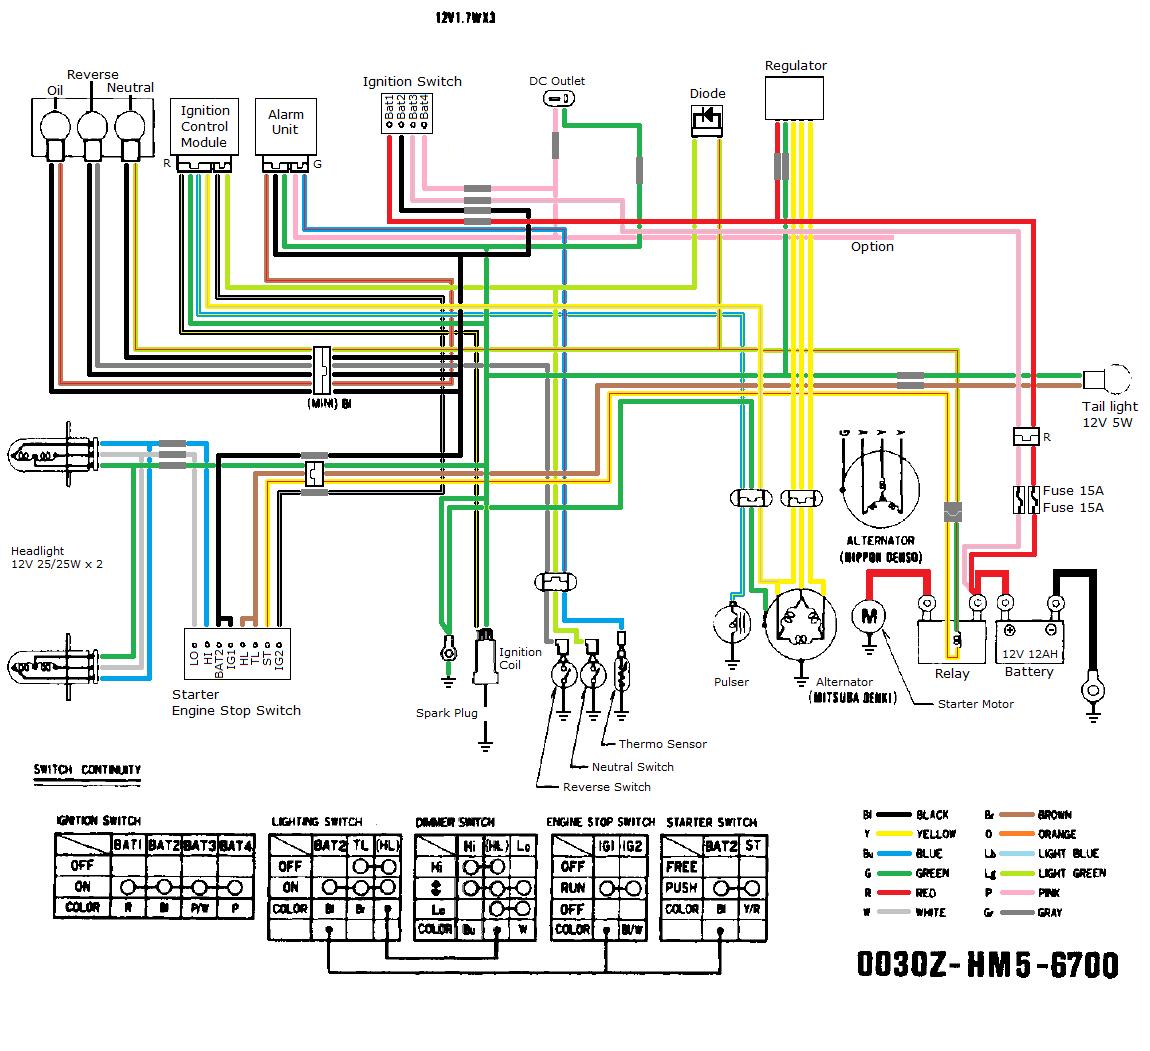 Wiring Diagram For A Giye 4 Wheeler